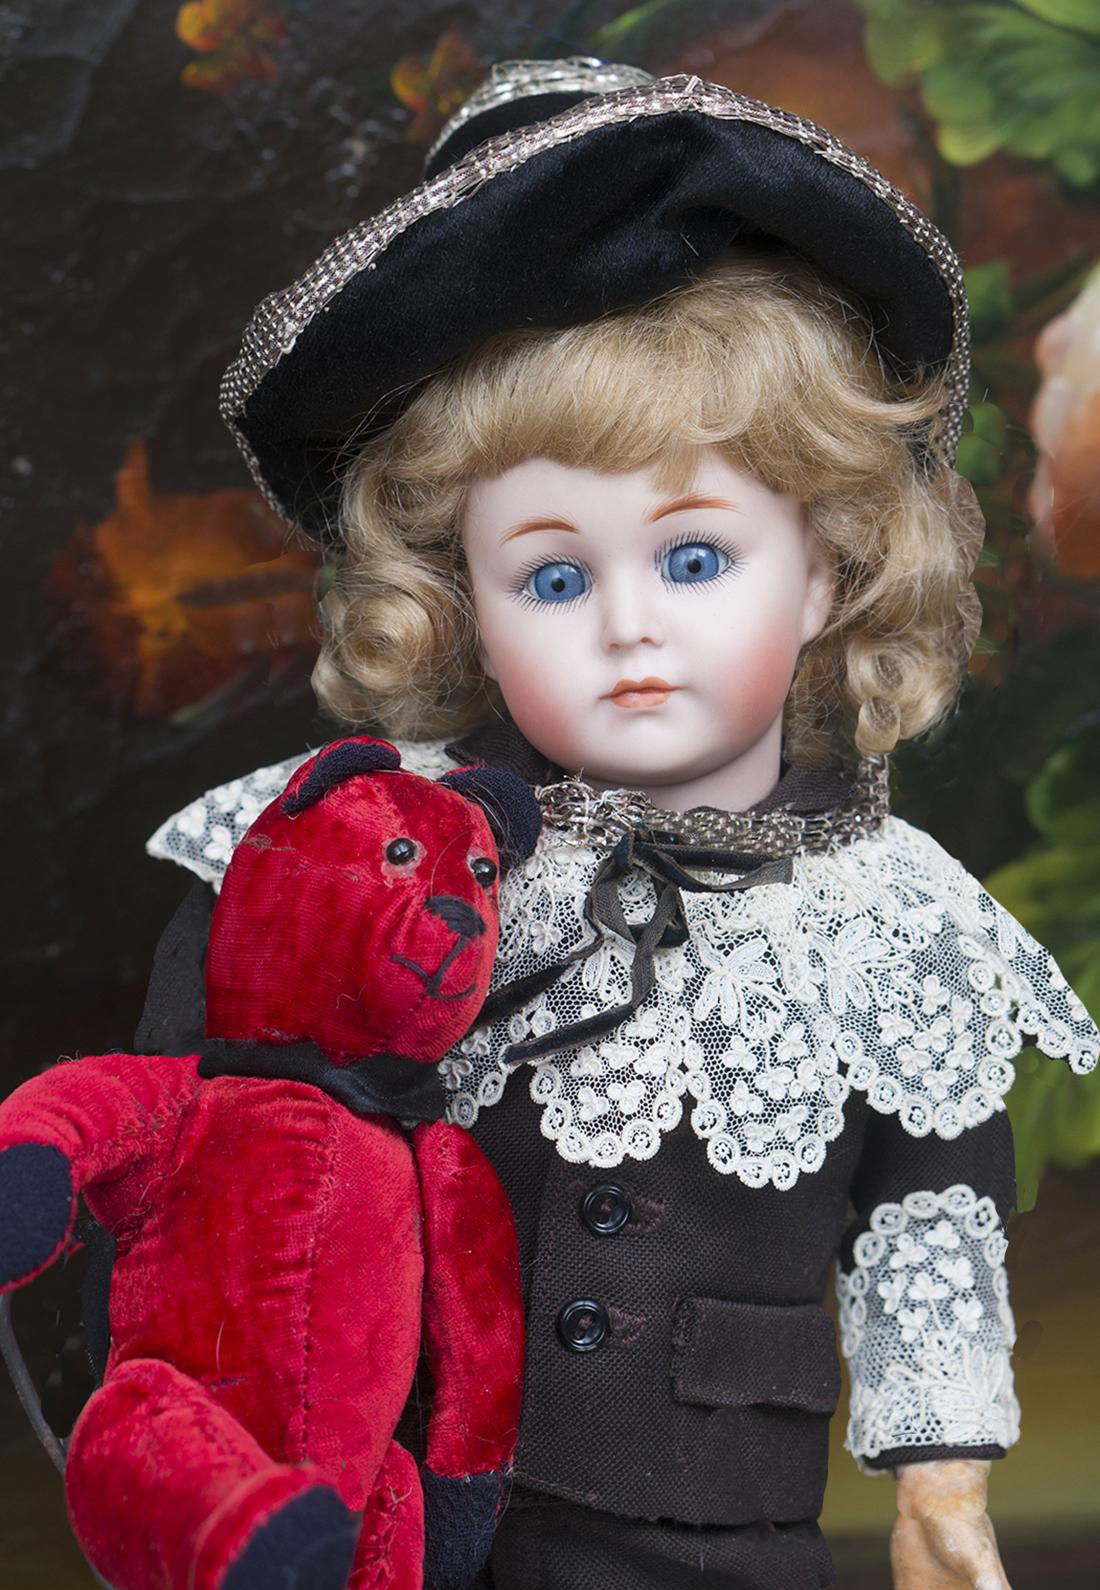 32 см Кукла MEIN LIEBLING модель 117